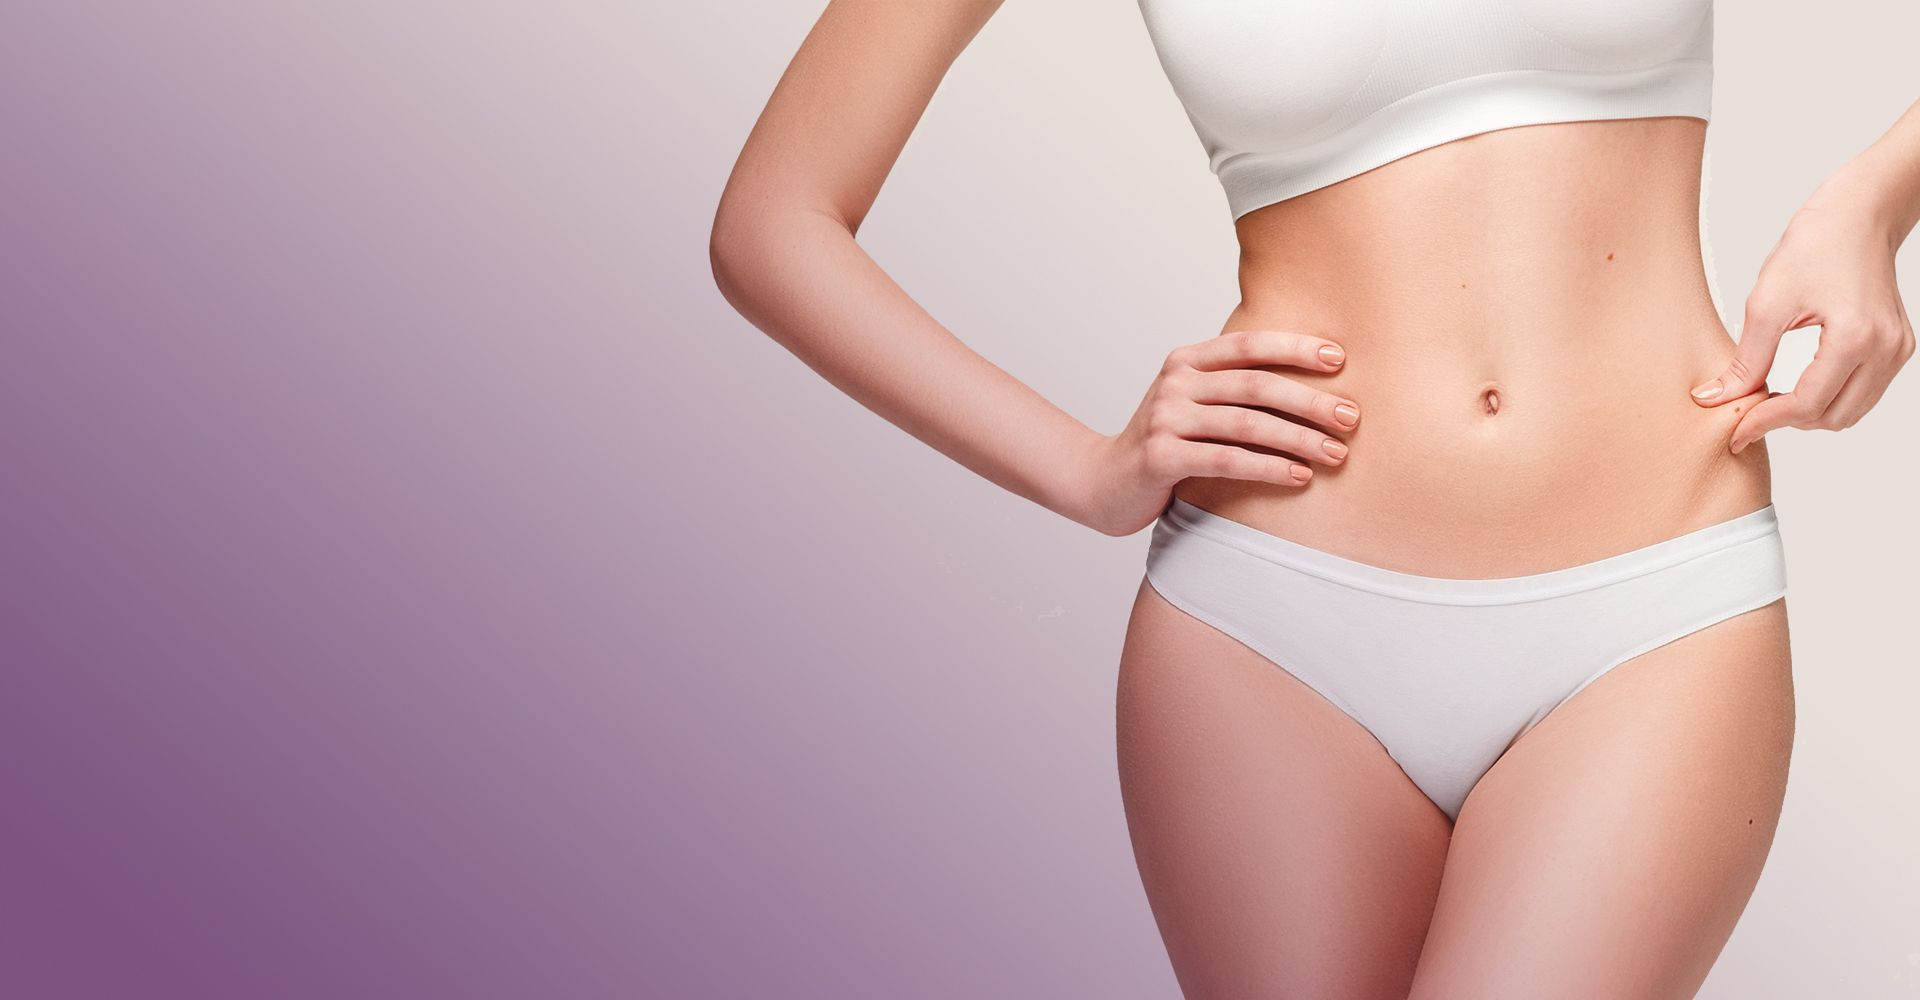 LoTempio Plastic Surgery for Women, Plastic Surgeon in New York NY